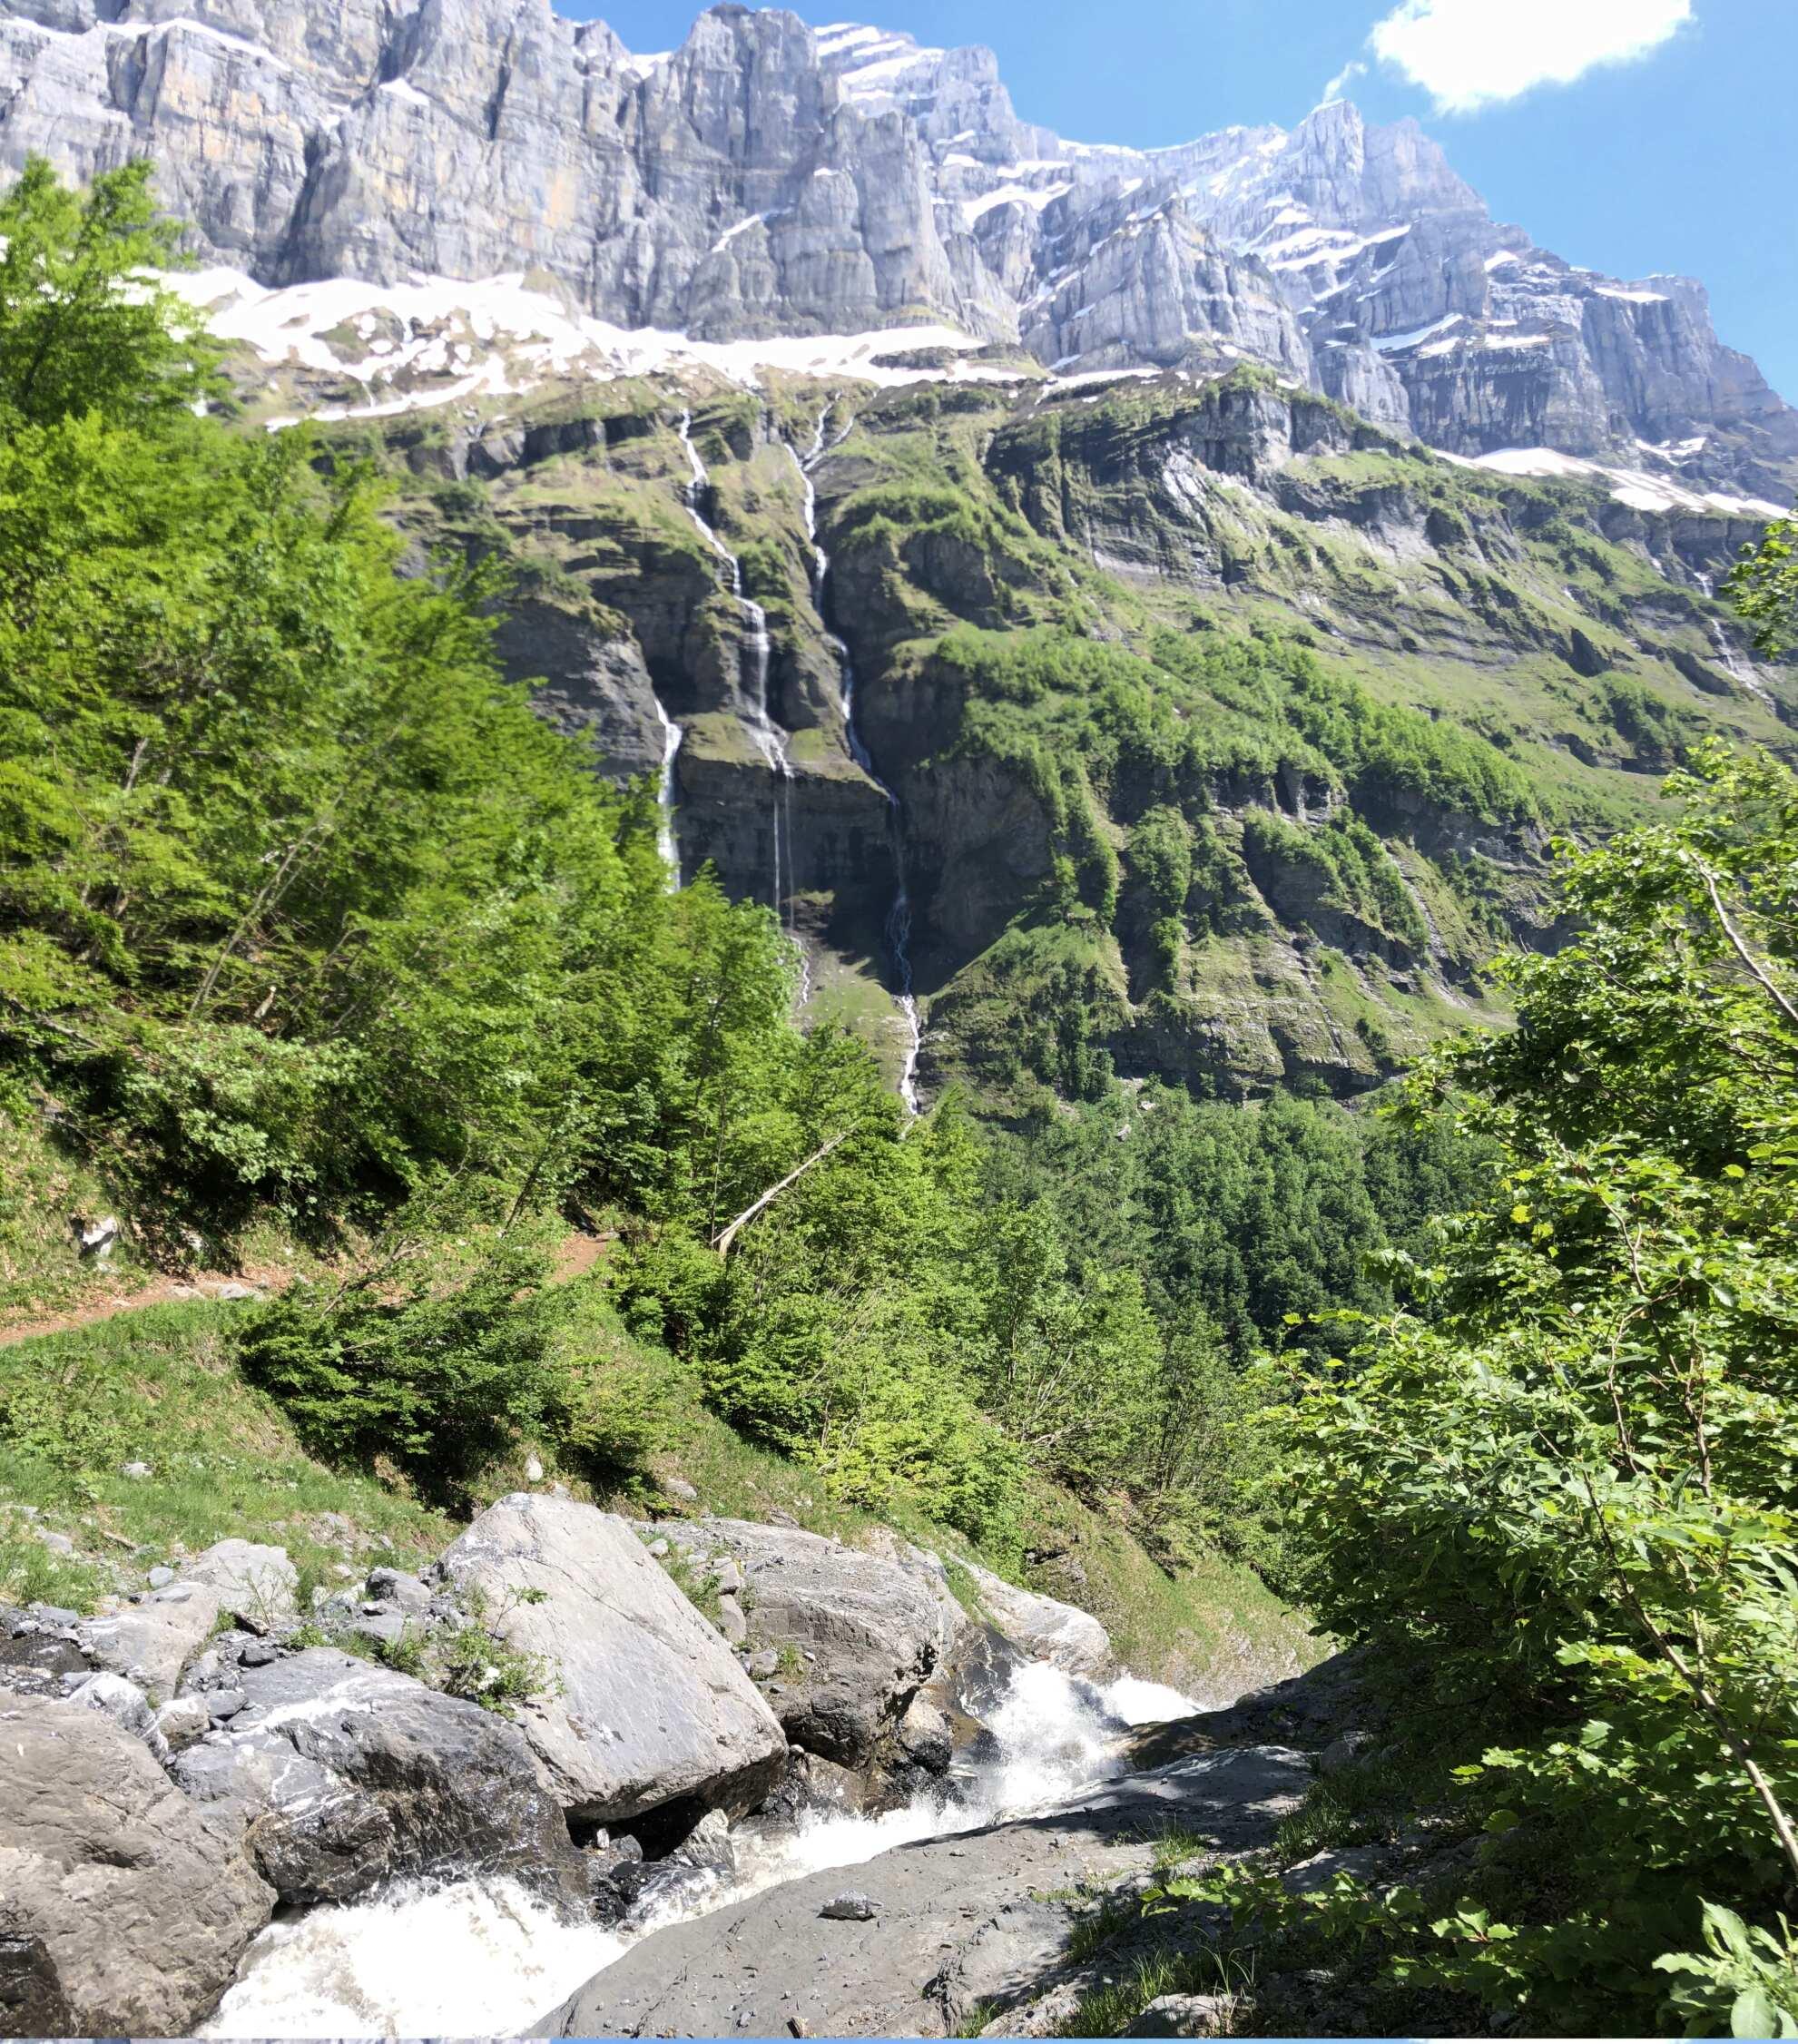 Petites balades en Rhône-Alpes - Page 3 Sixt_f24